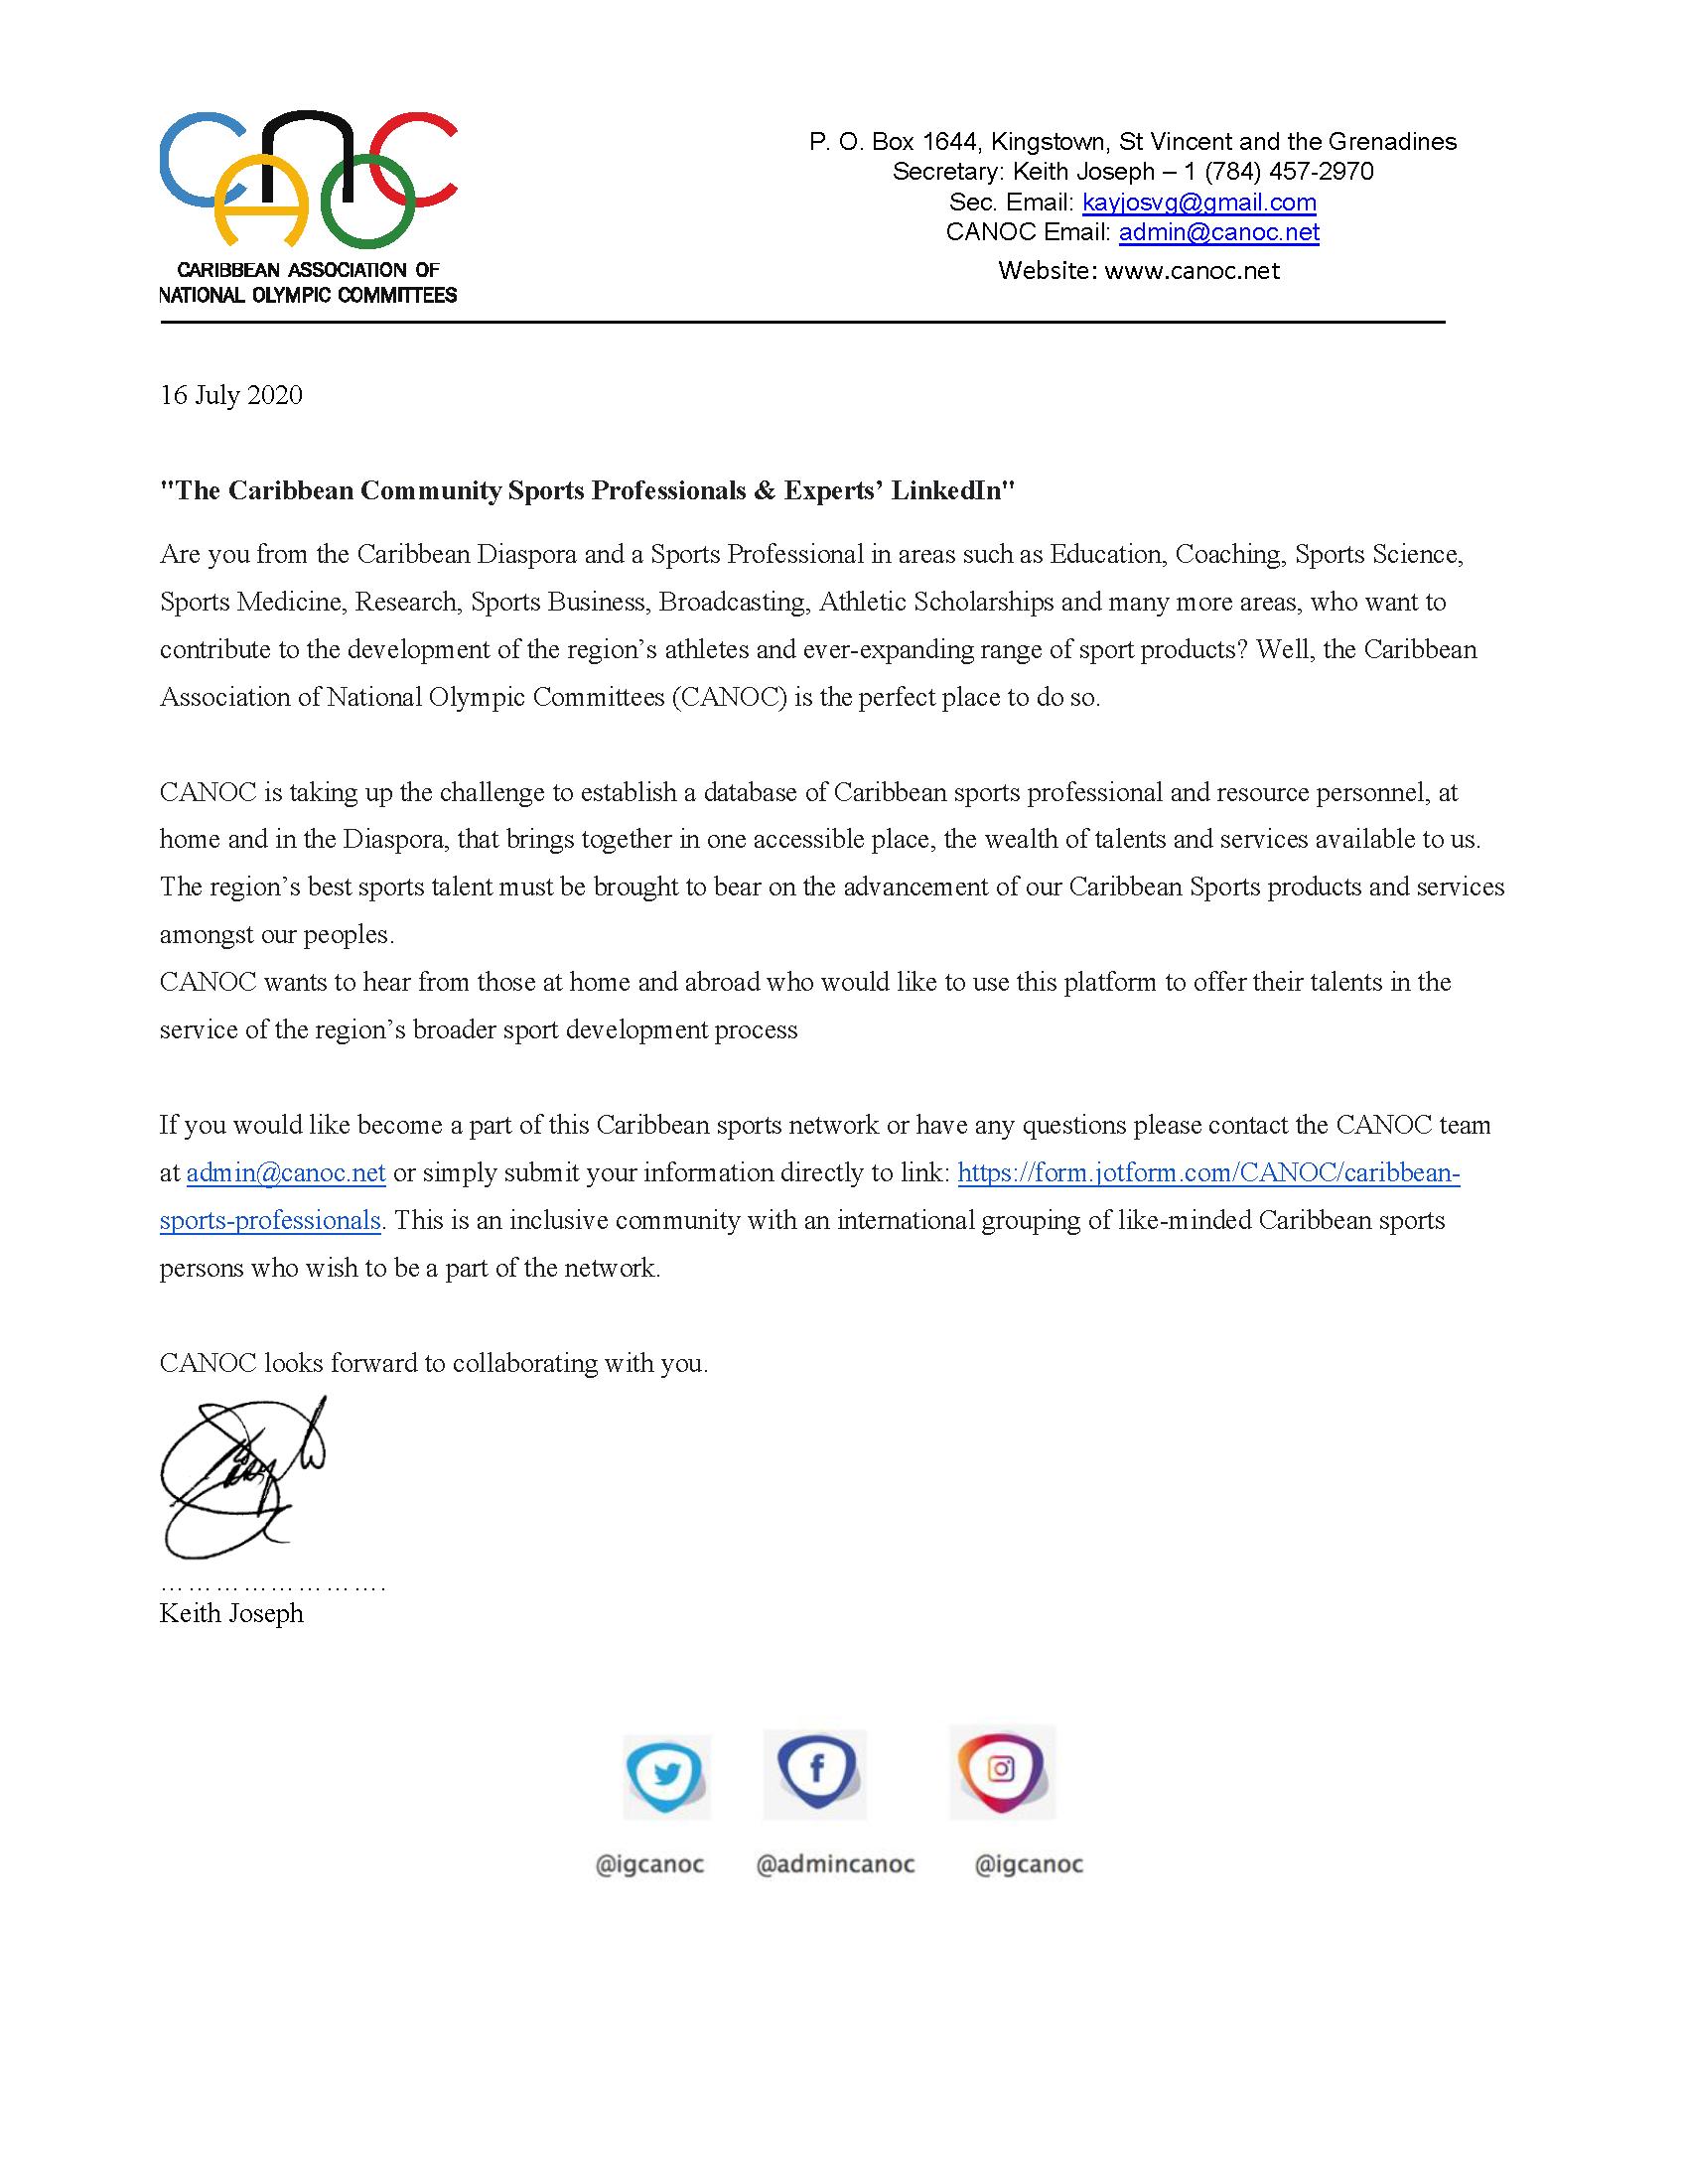 CANOC circular 16-07-2020